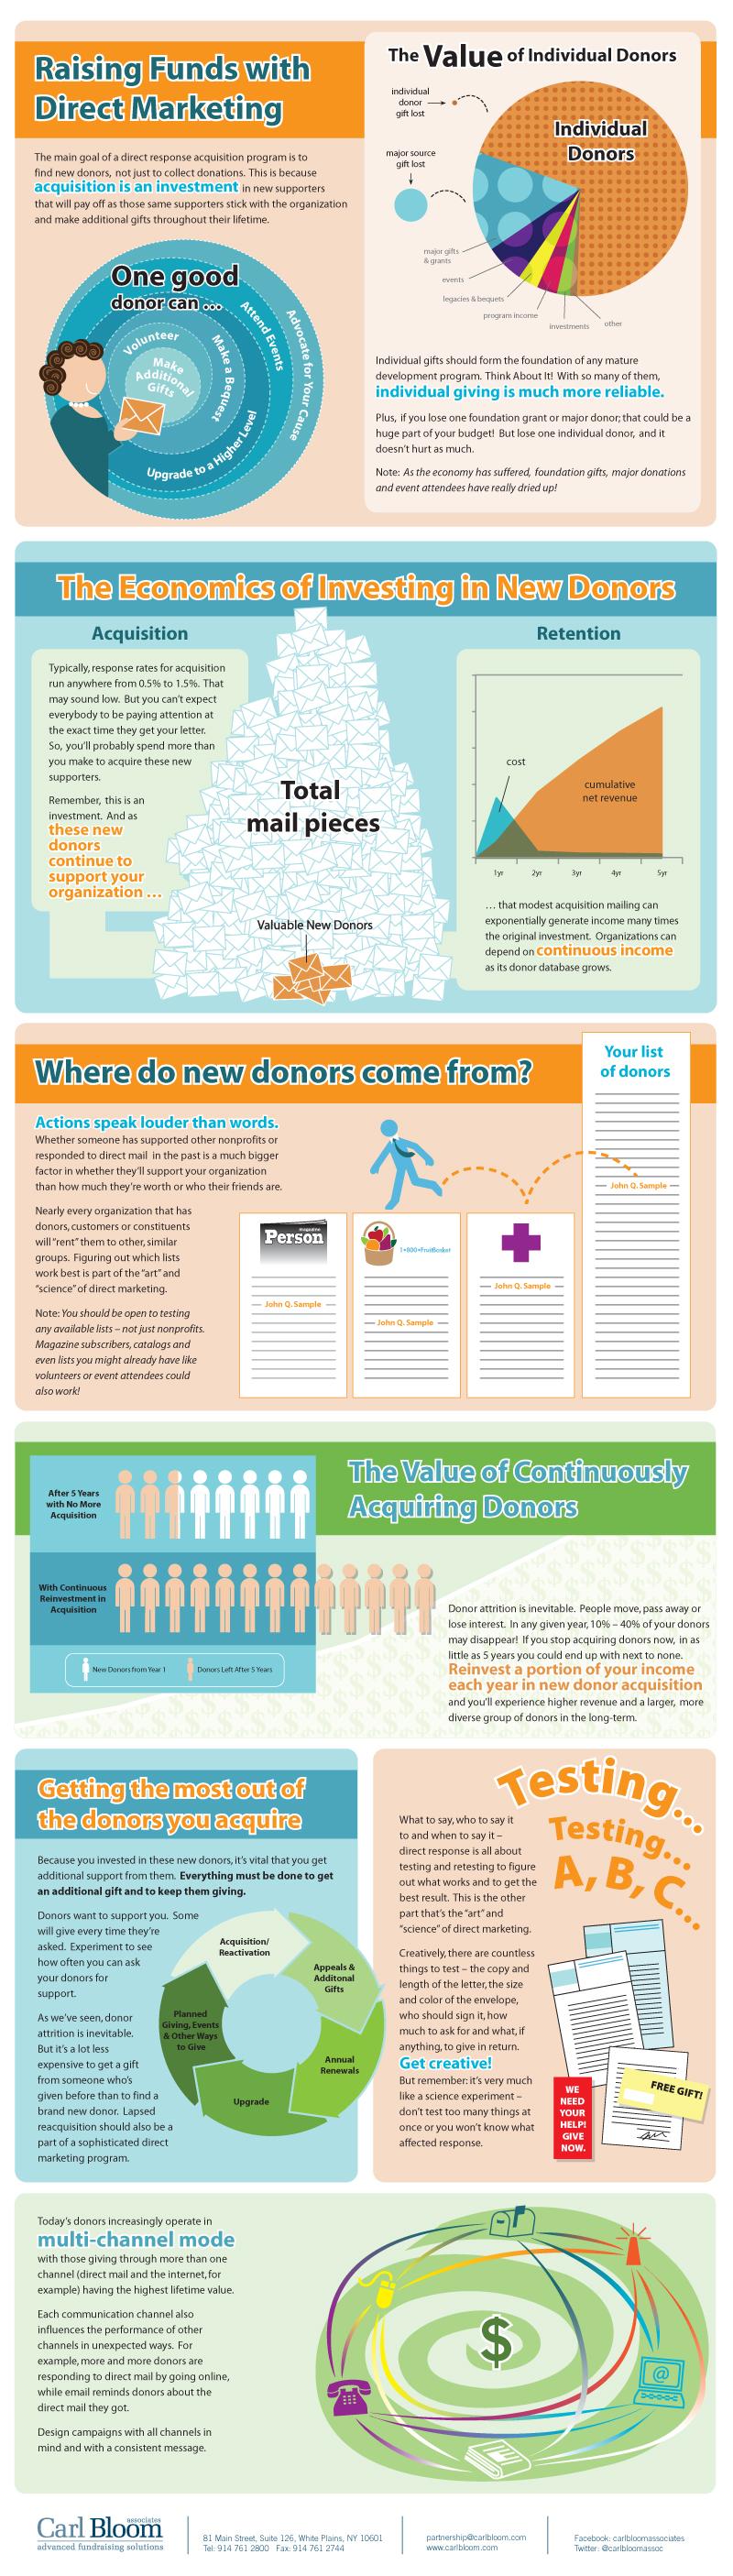 Direct Marketing Fundraising